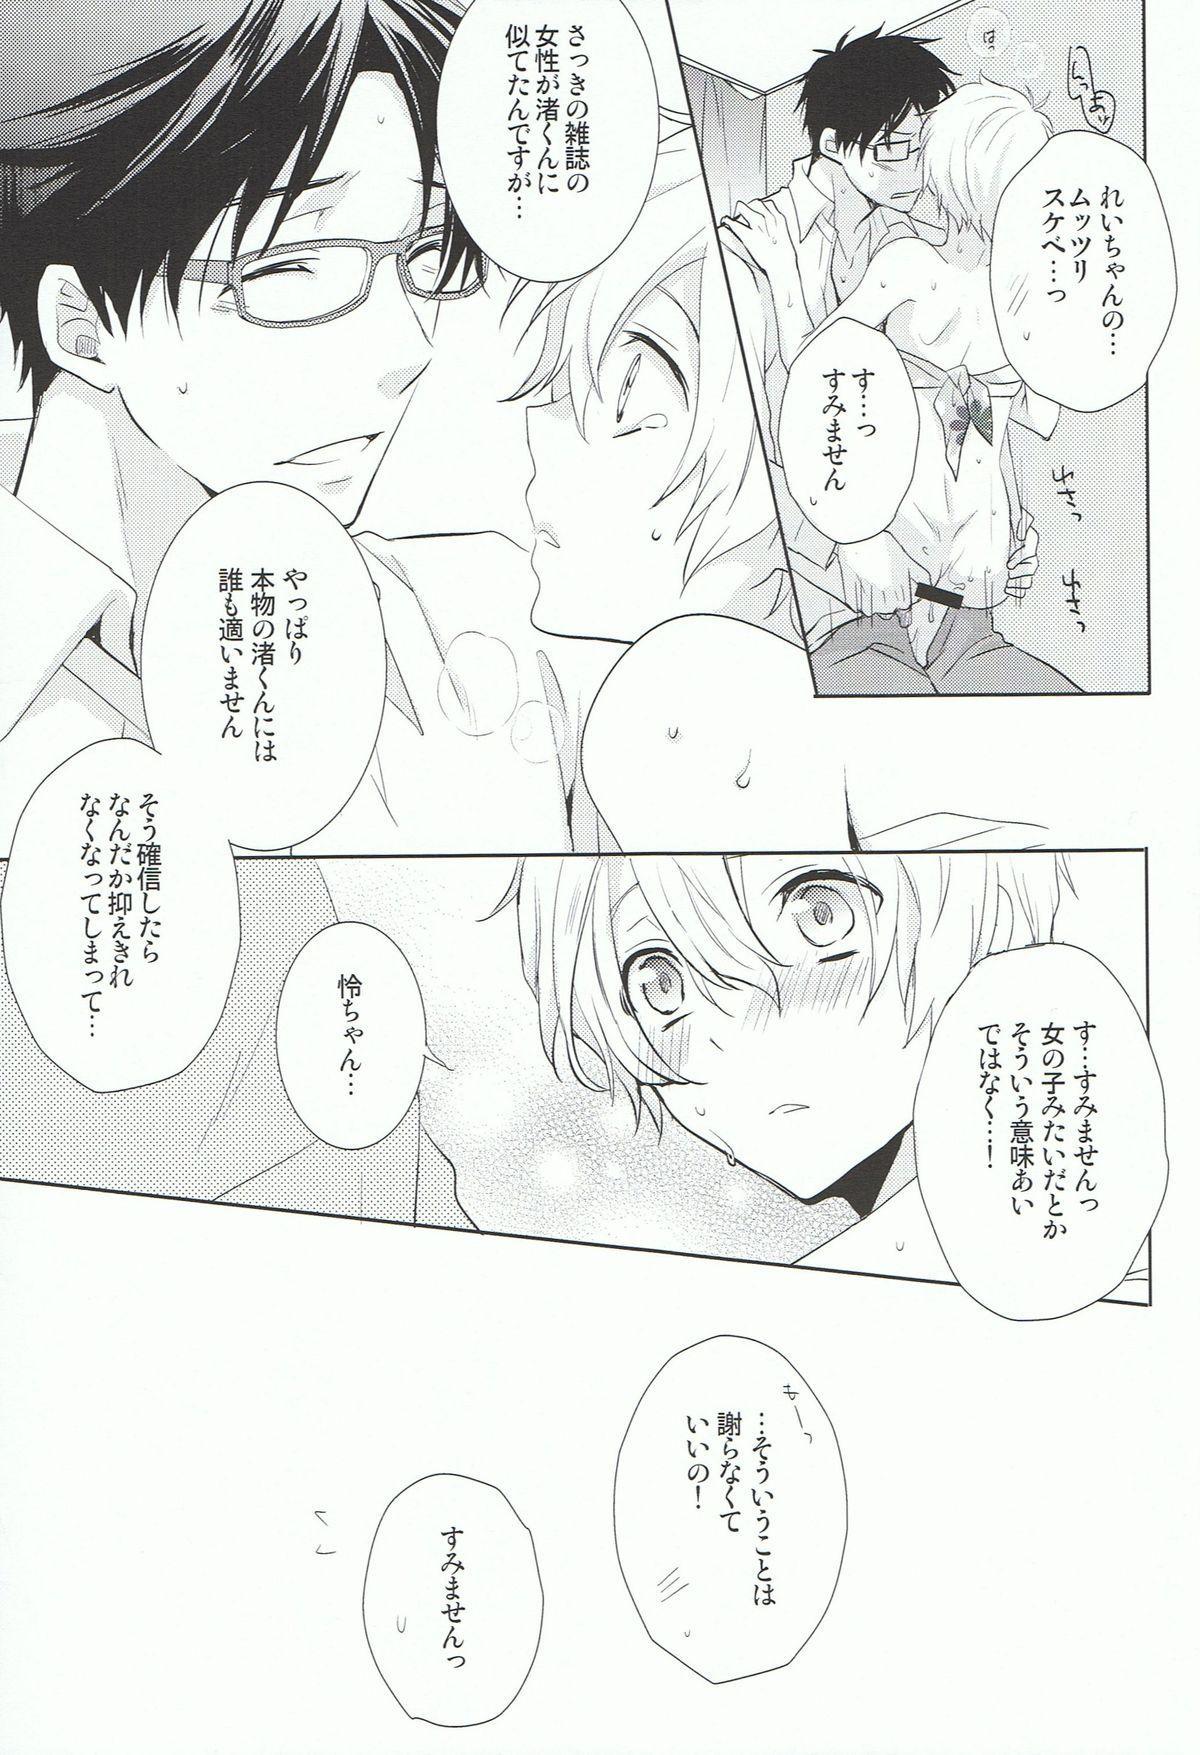 Nagisa-kun de ii deshou! 17